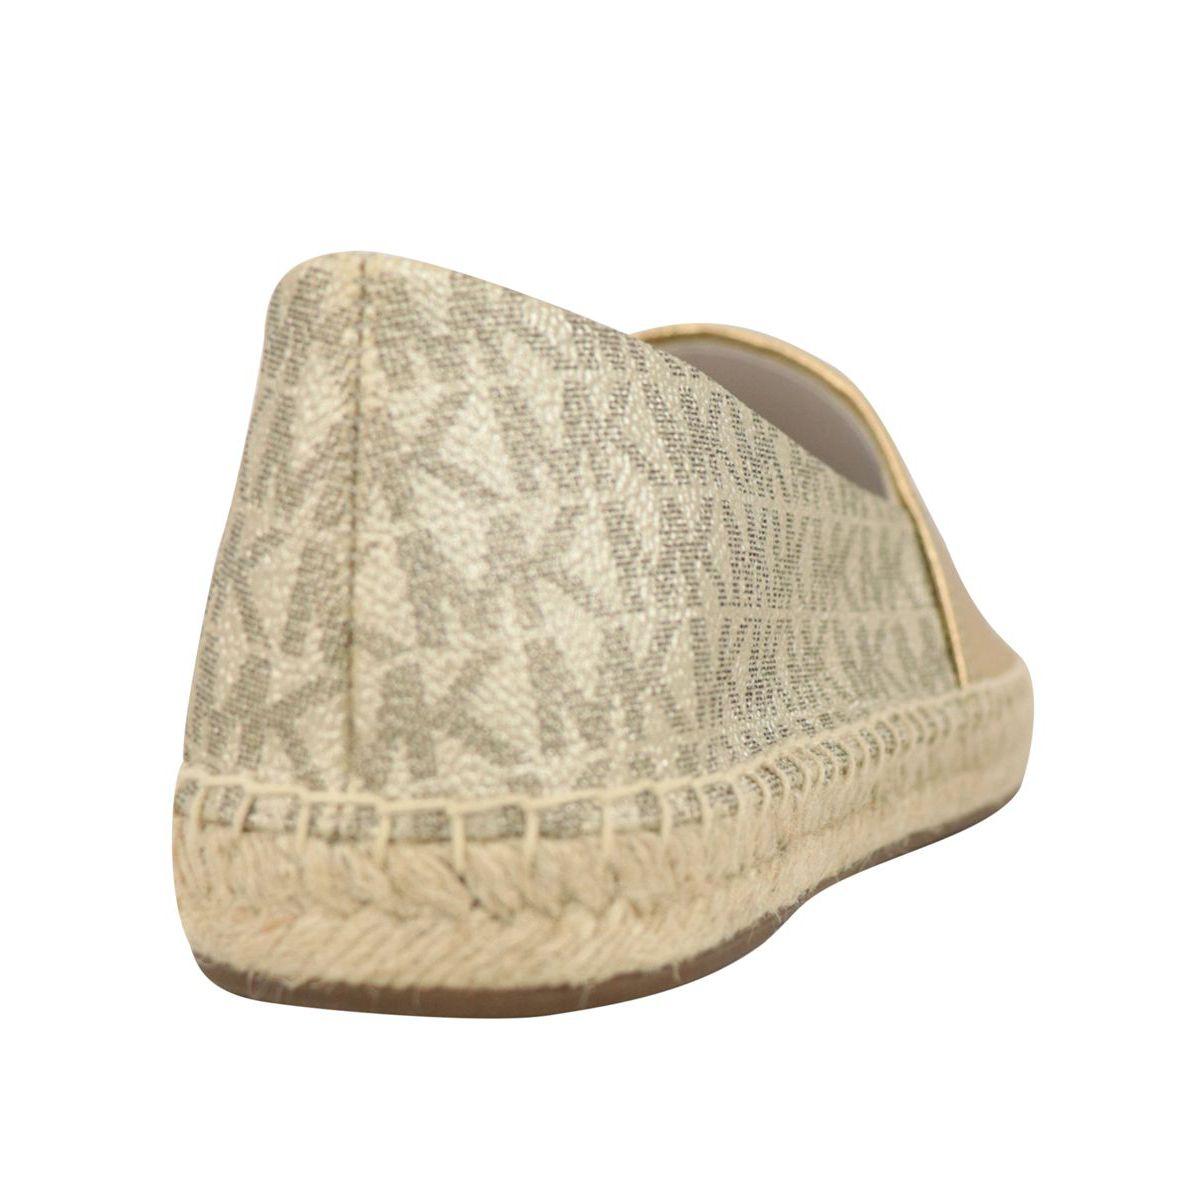 Dylyn monogram leather espadrilles Gold Michael Kors